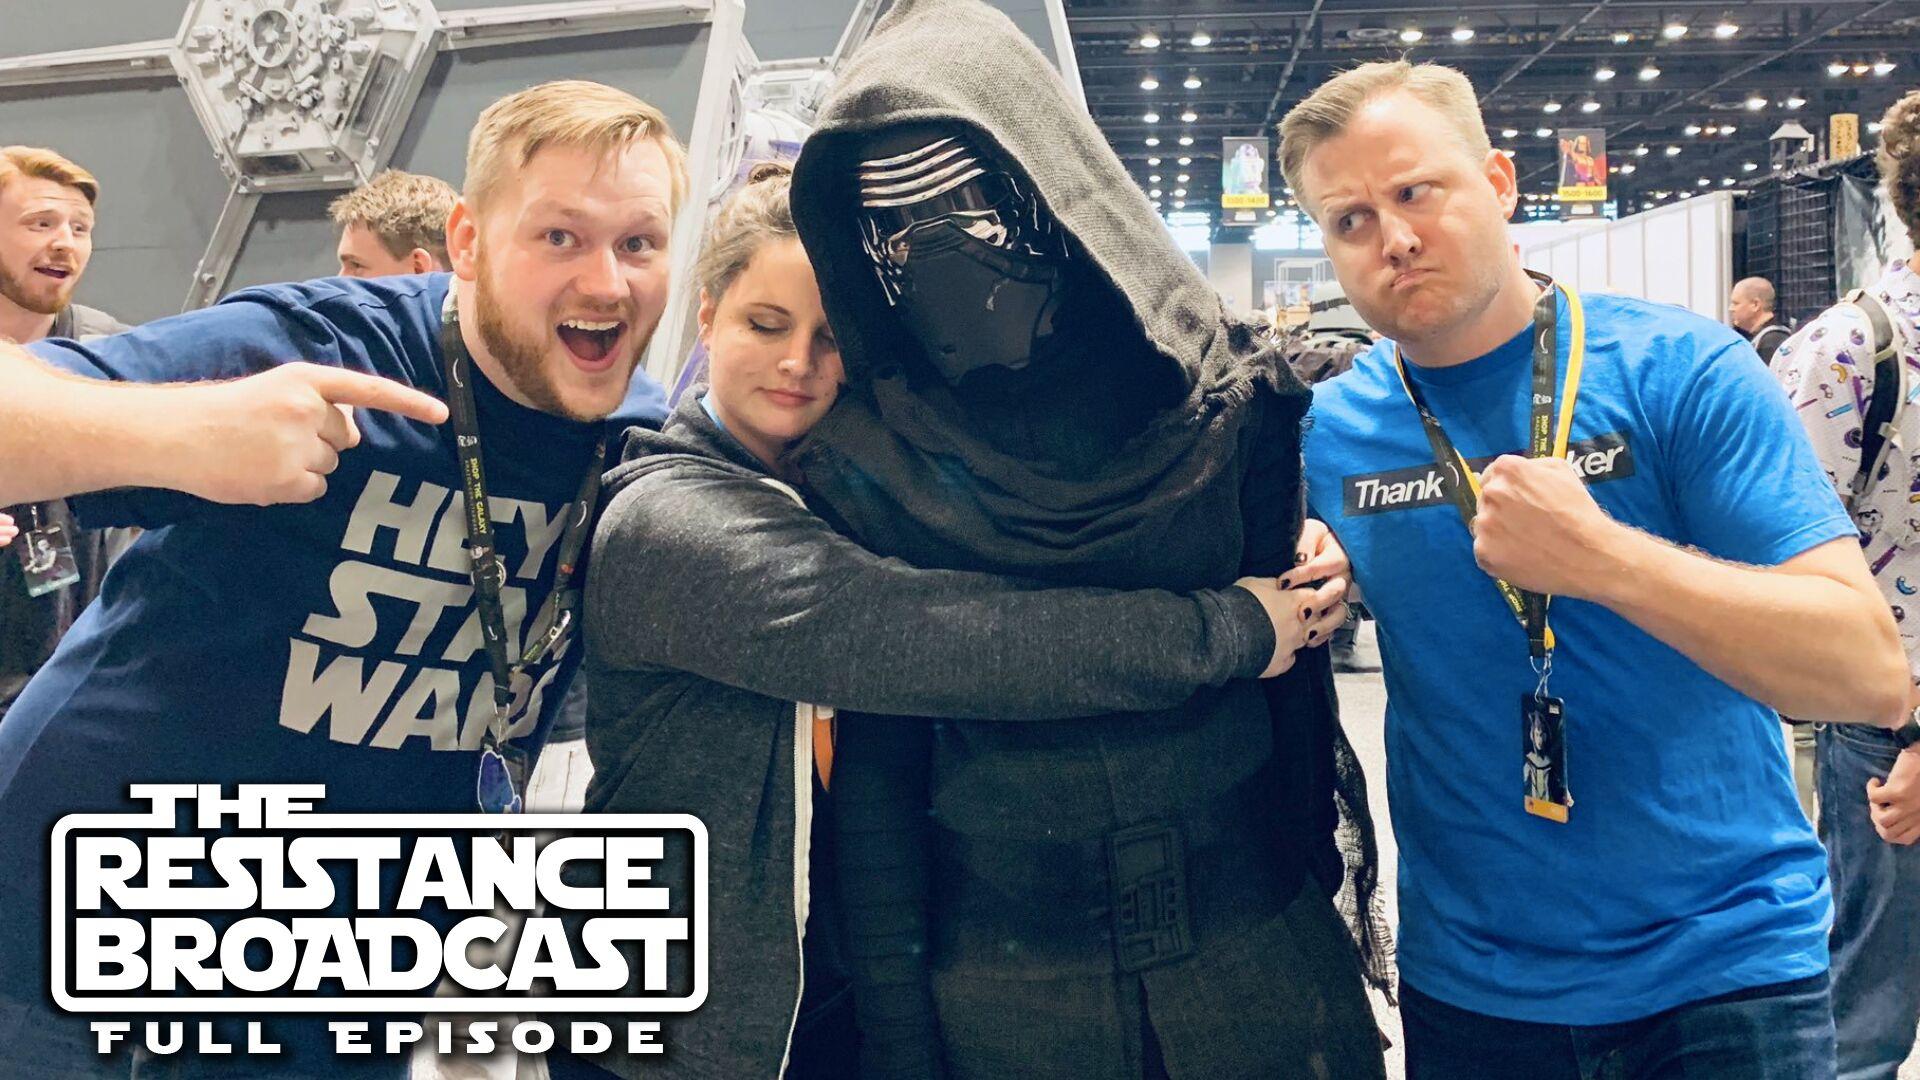 The Resistance Broadcast Star Wars Celebration Complete